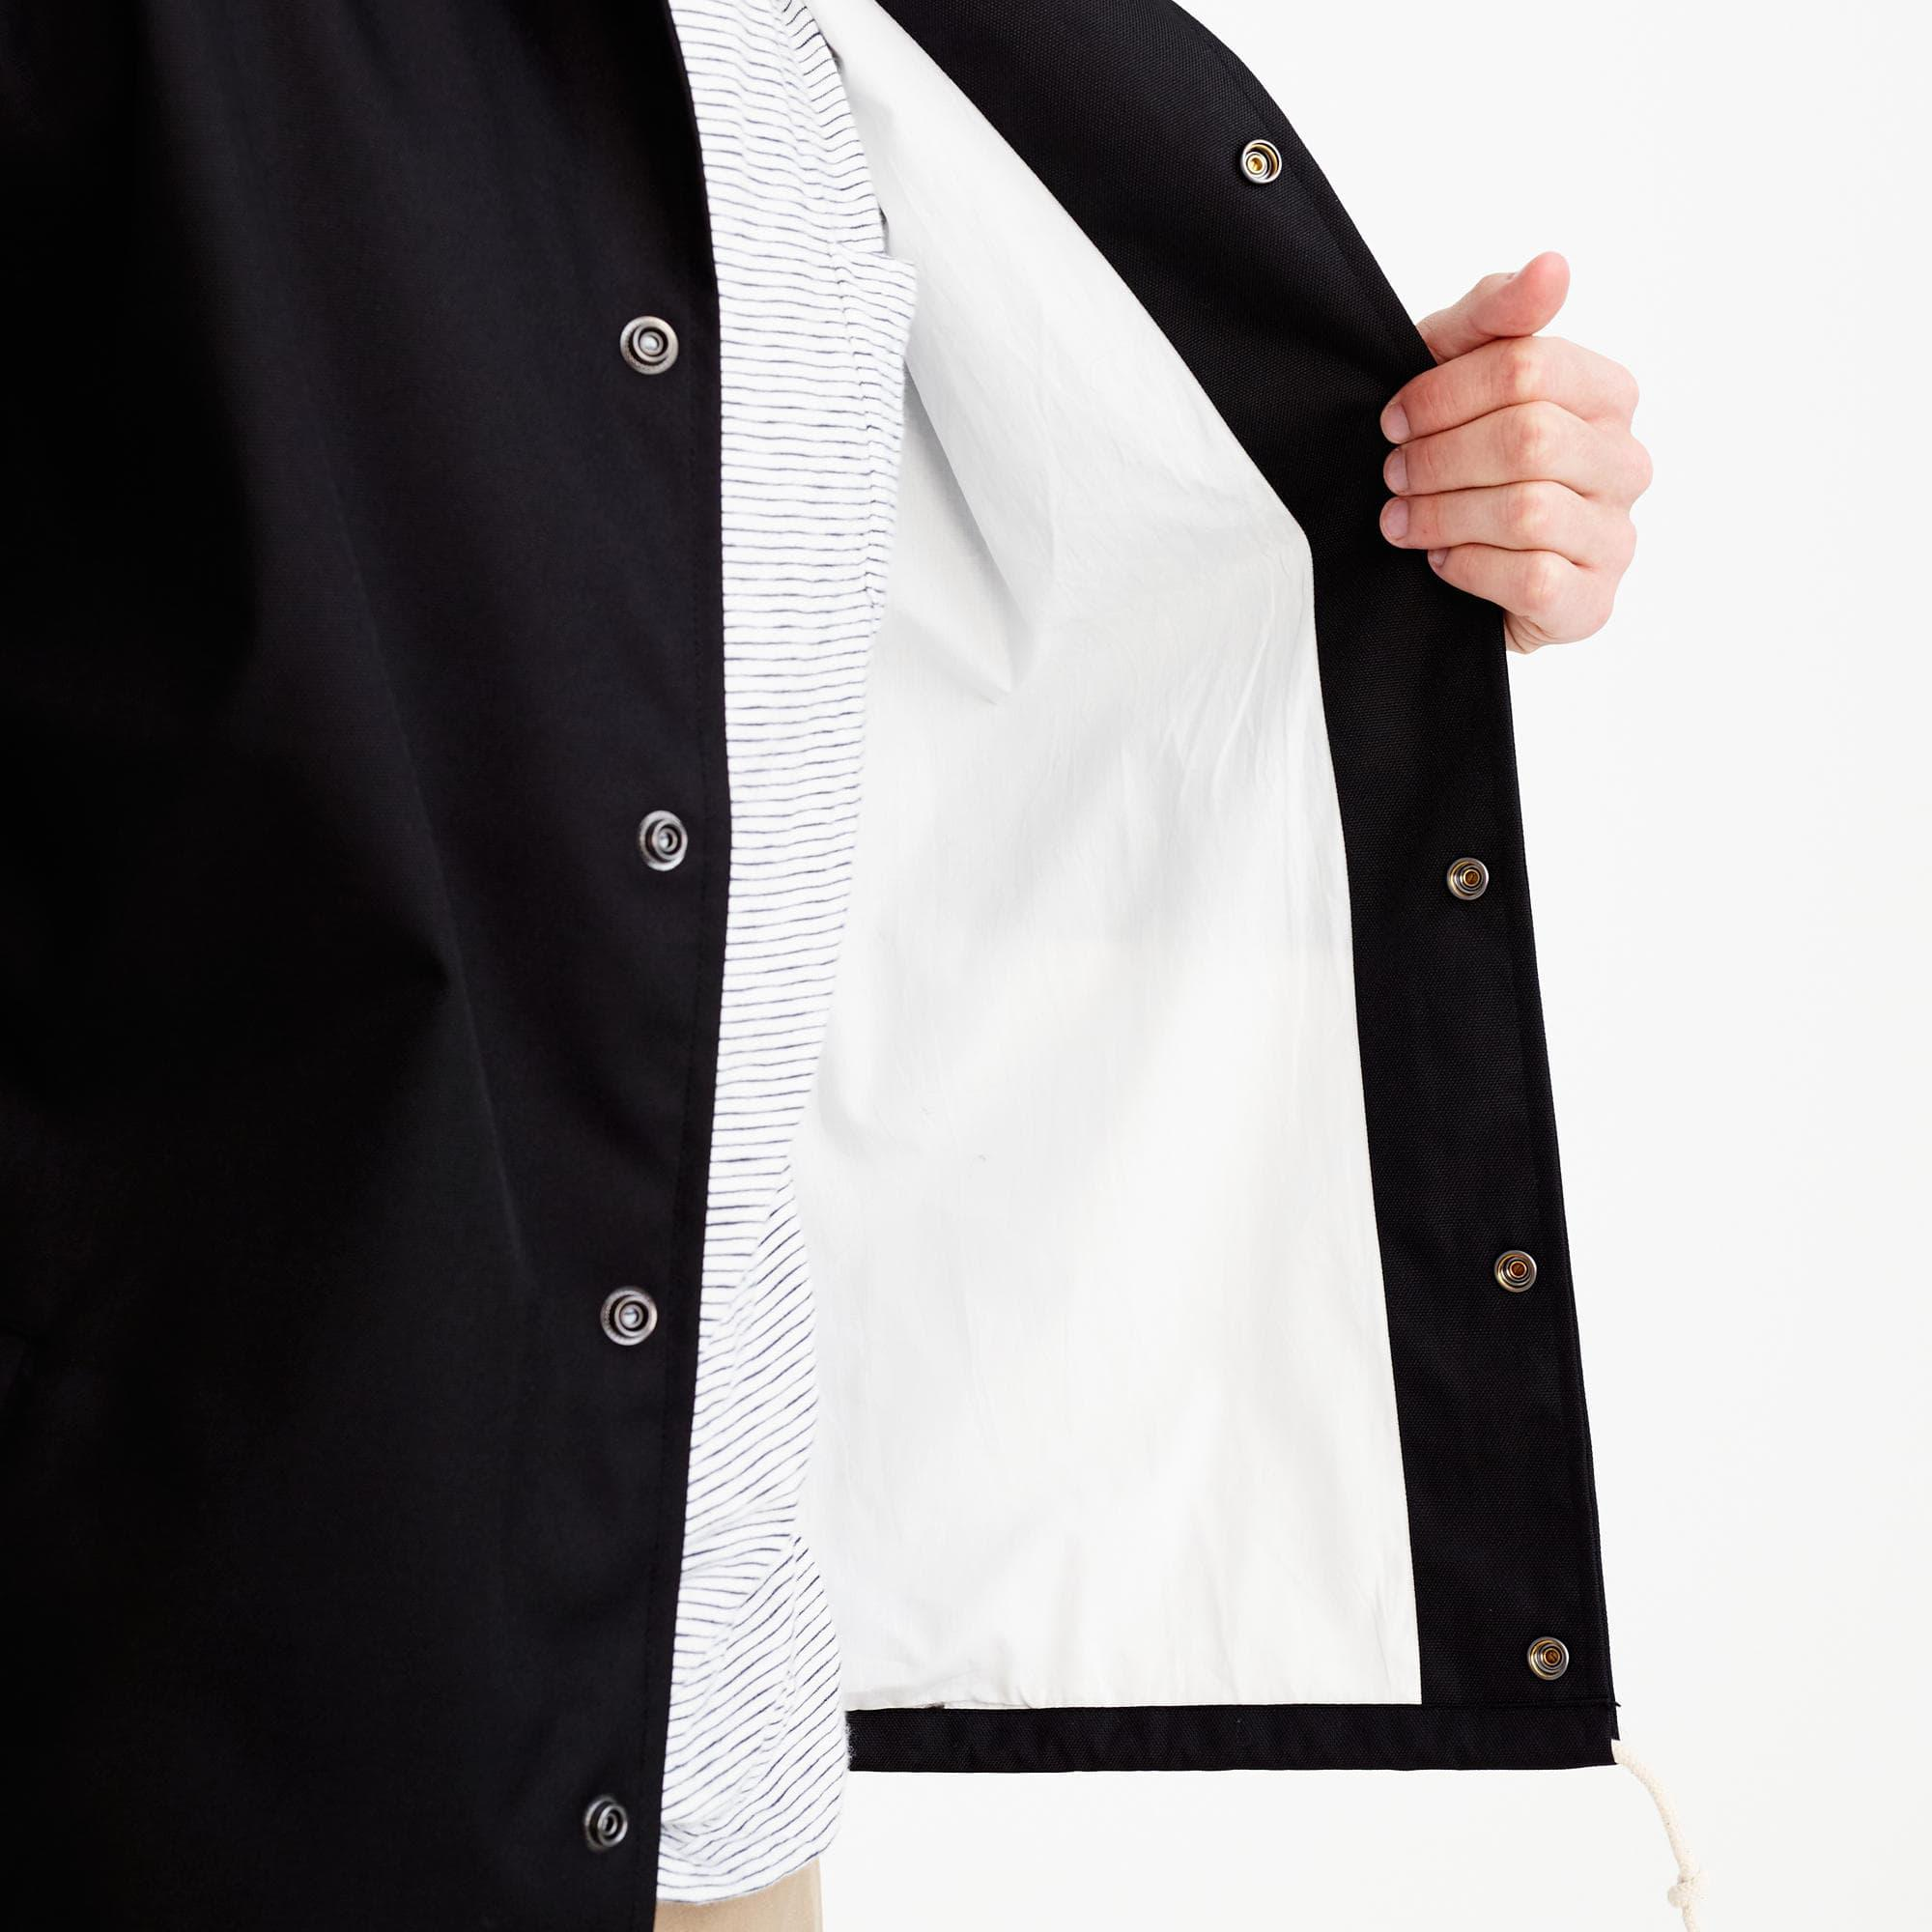 J.Crew Canvas Carhartt Work In Progress Coach's Jacket In Black for Men